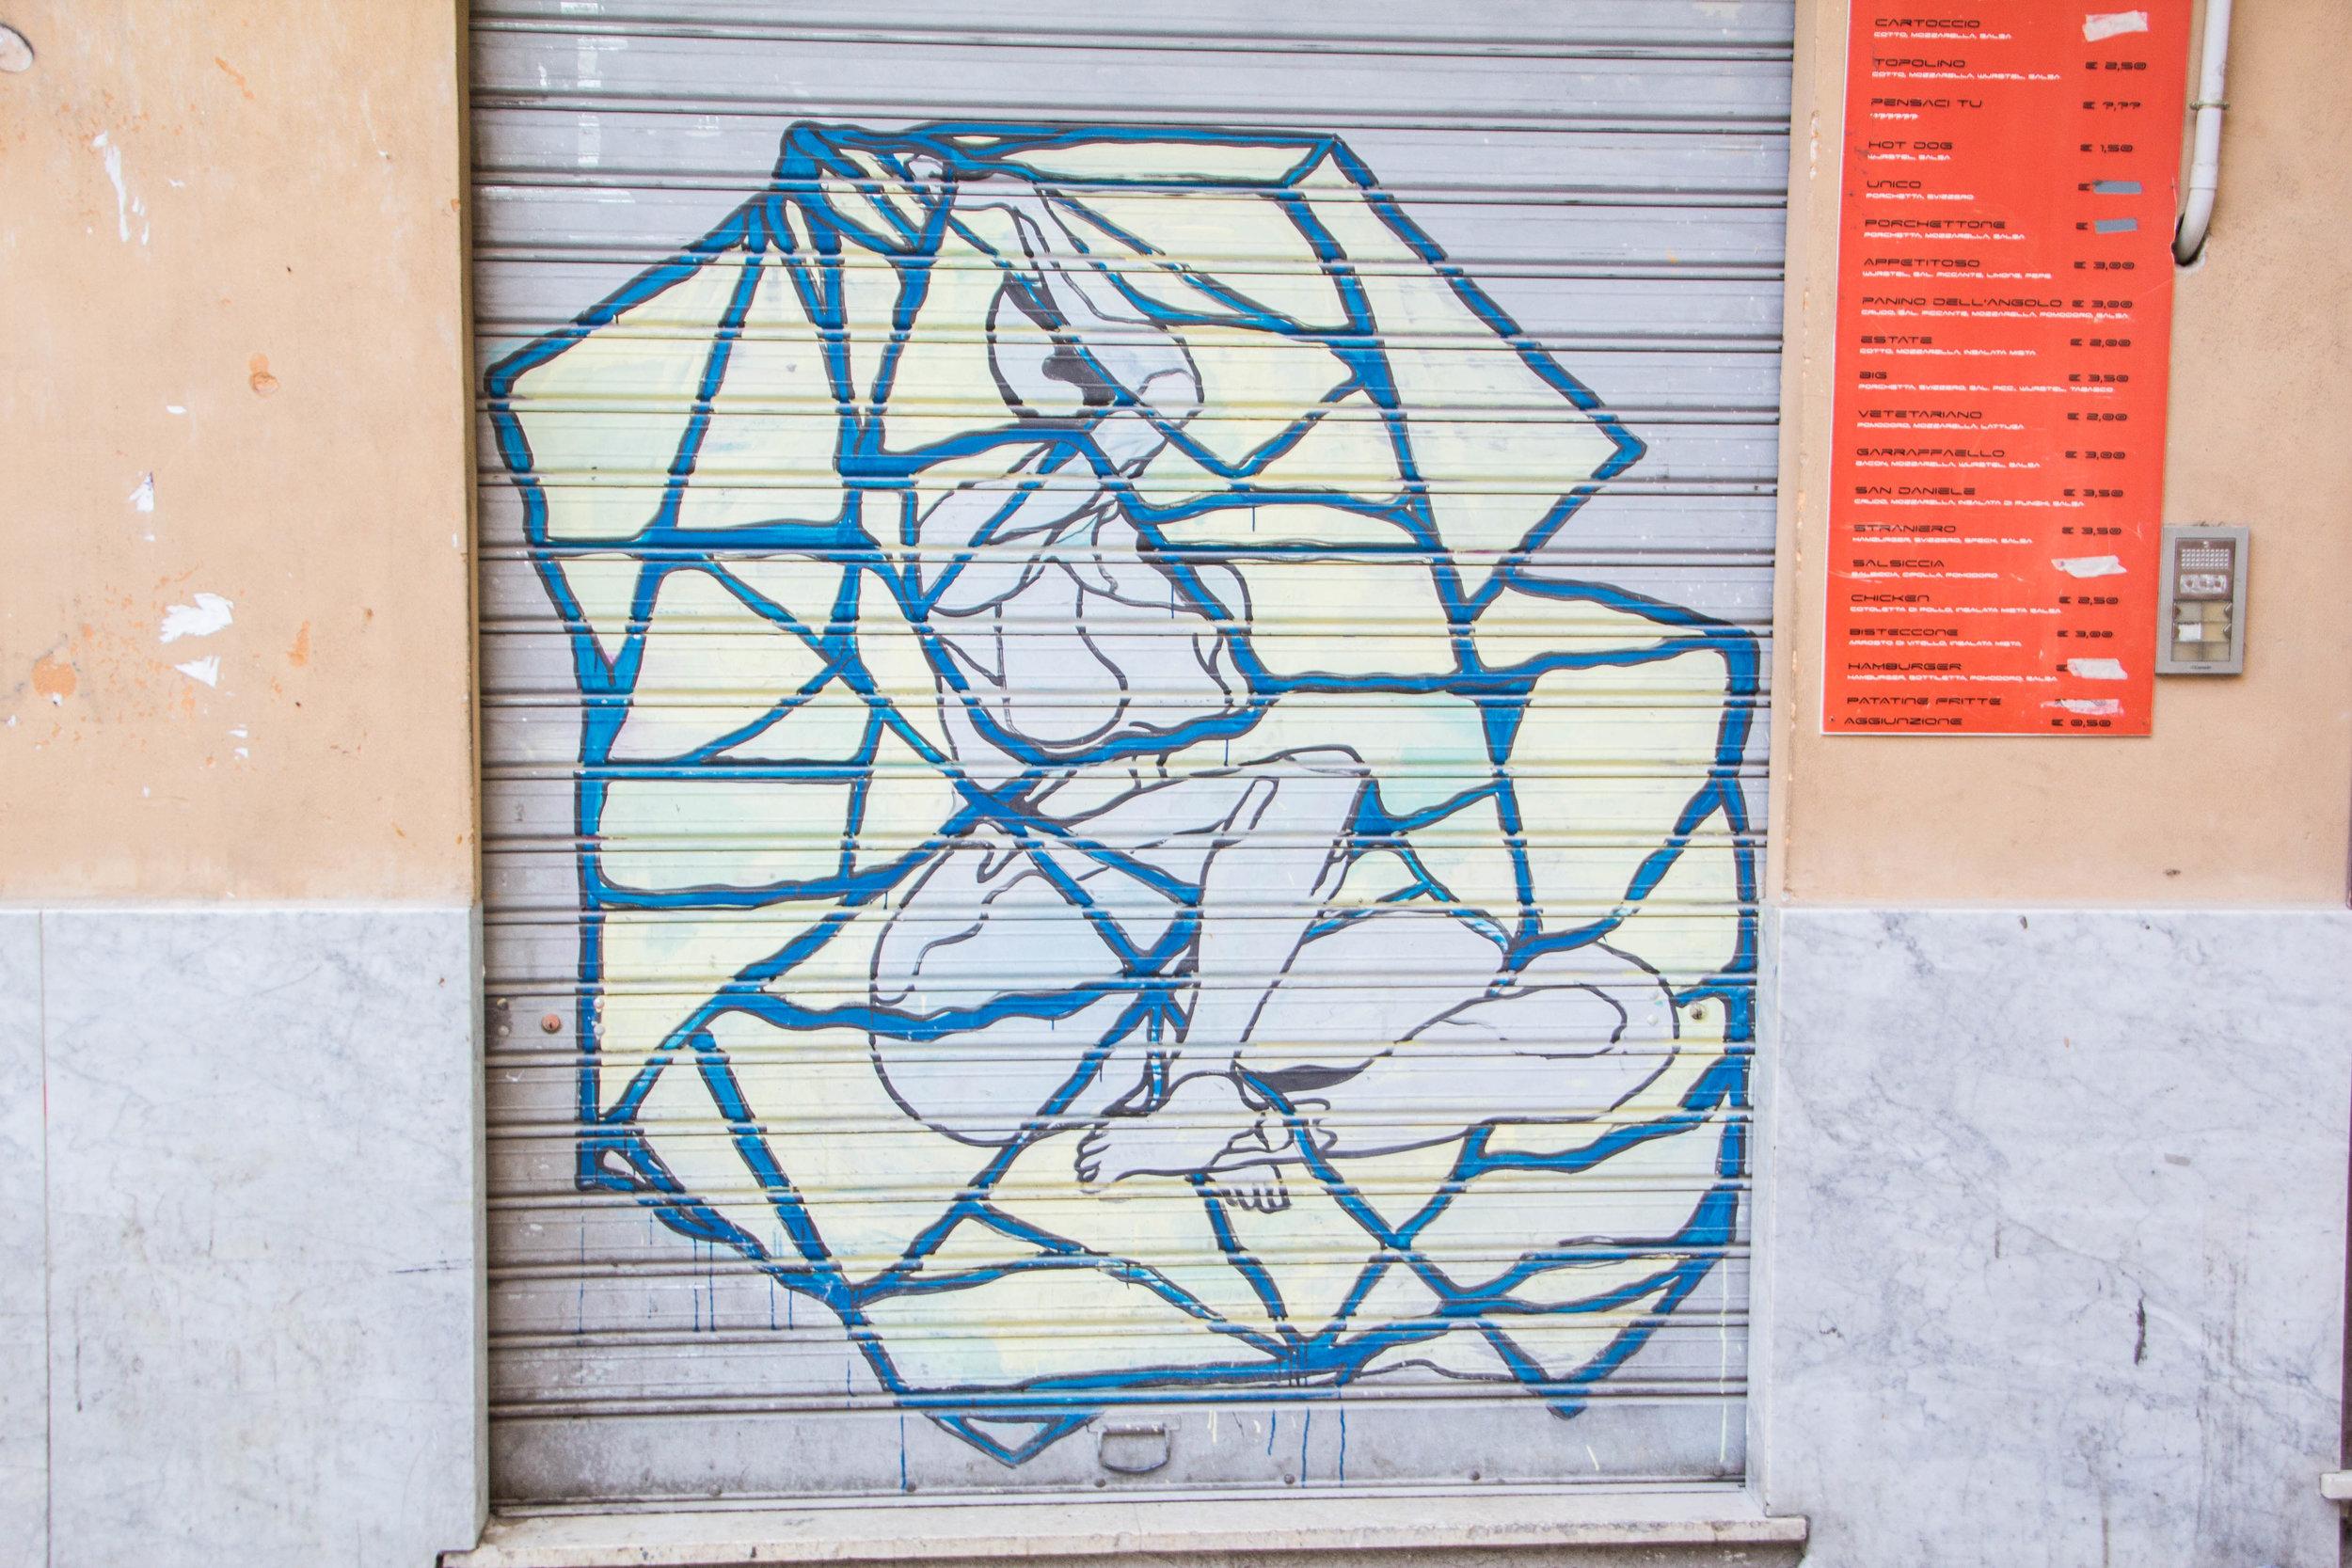 street-art-palermo-sicily-40.jpg